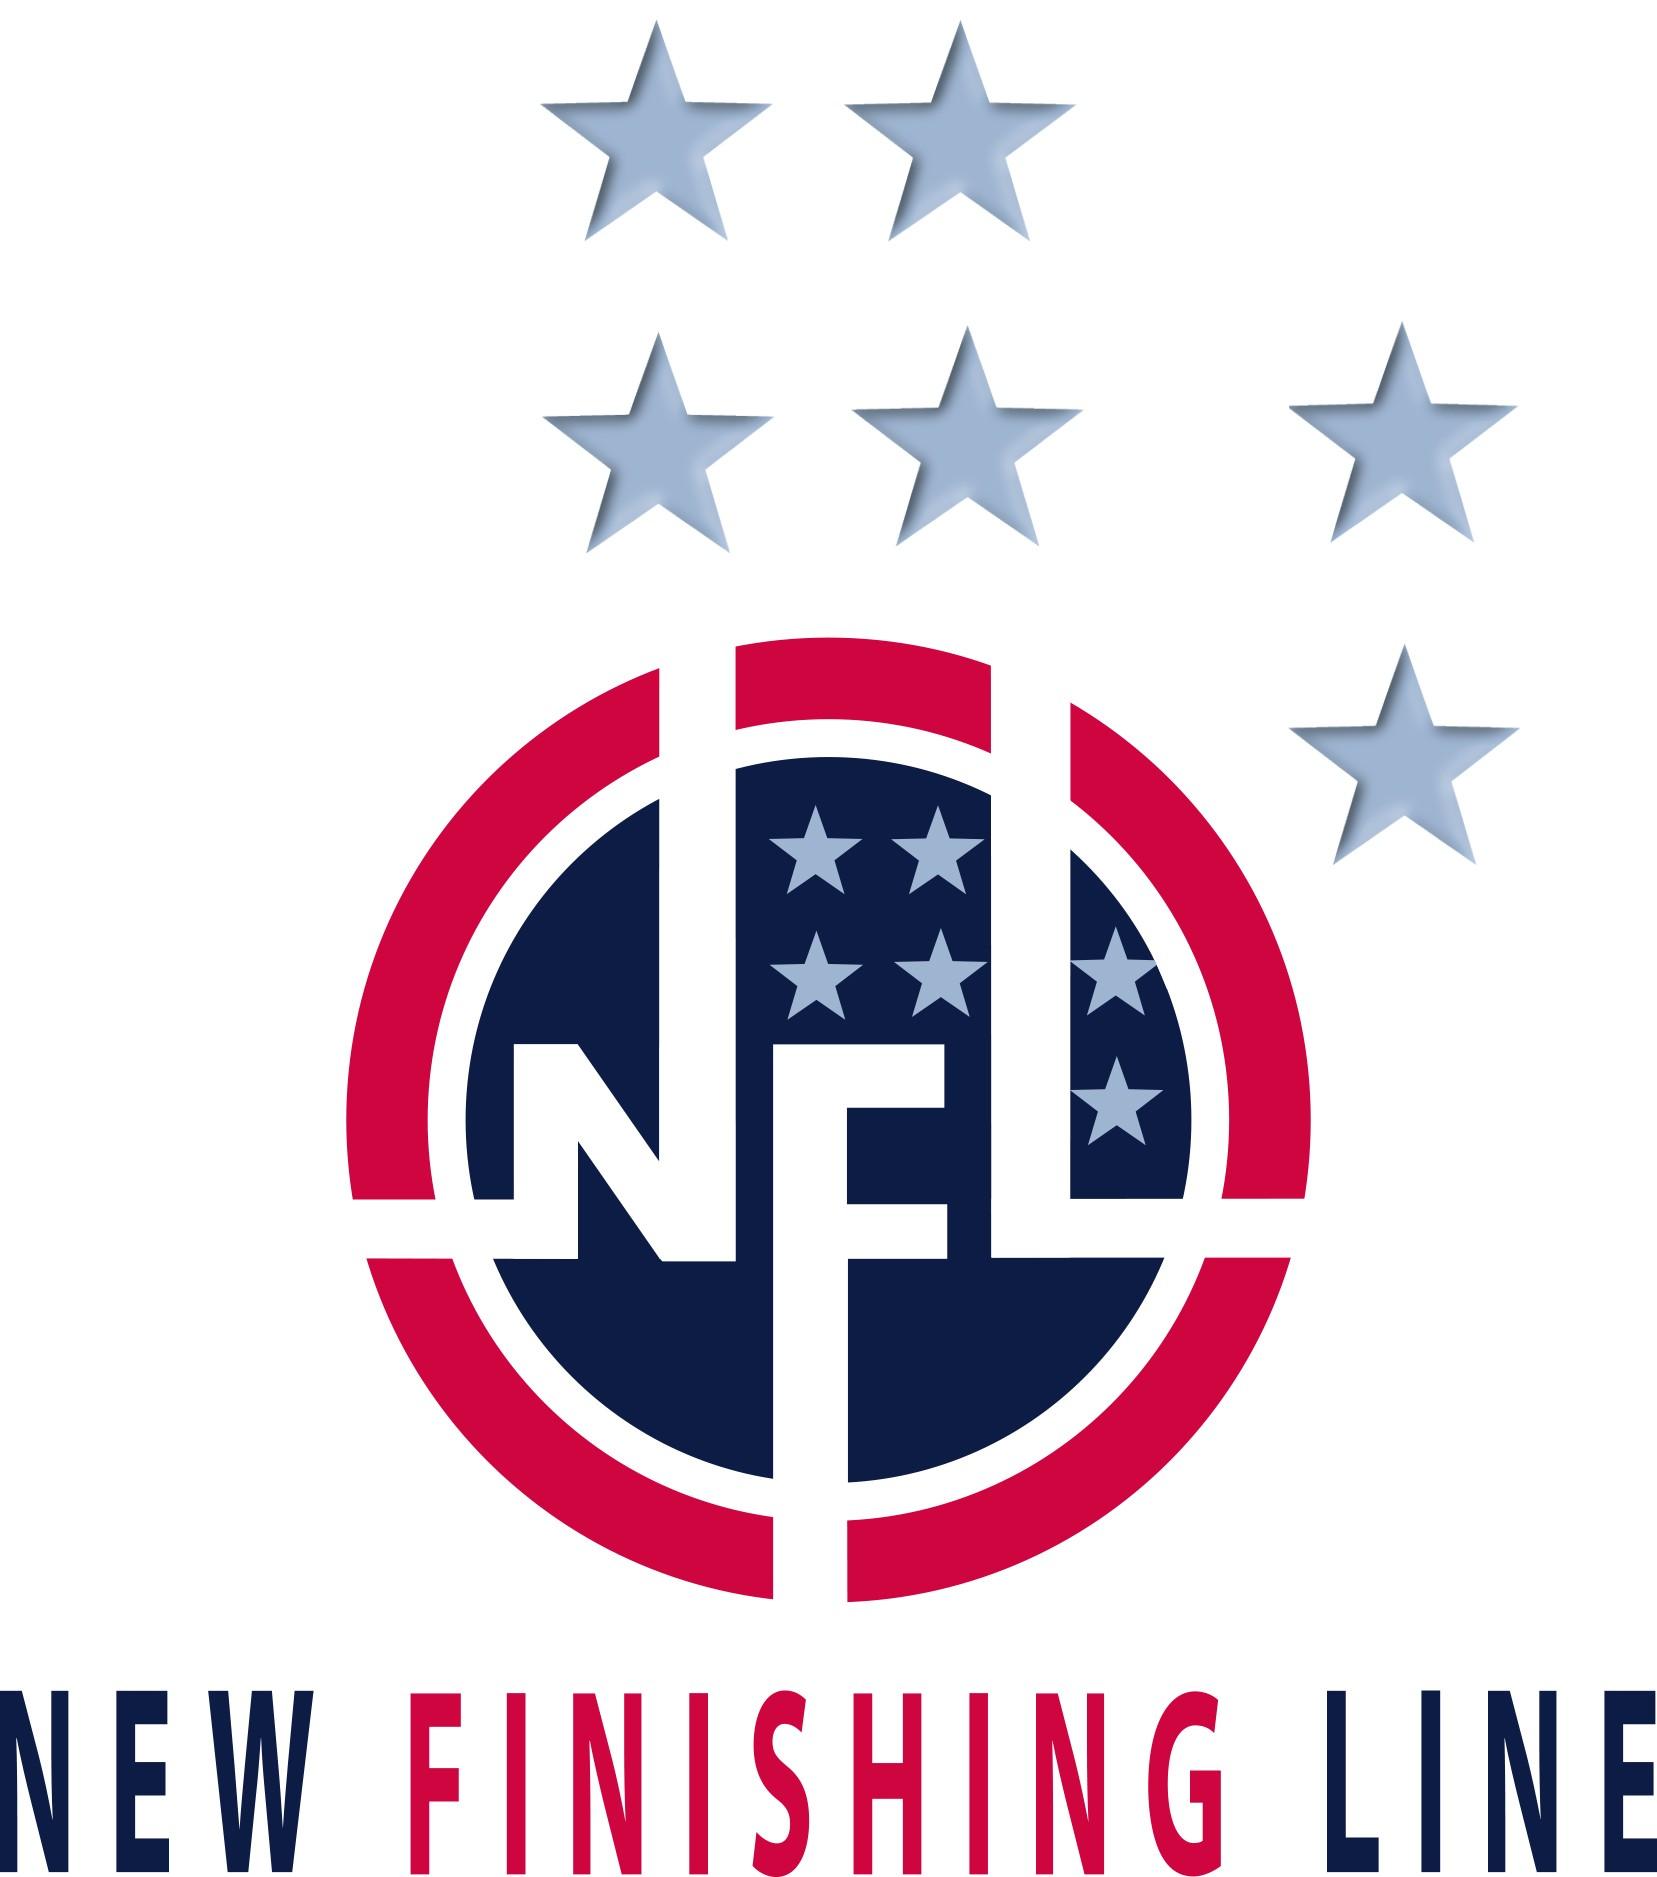 NEW FINISHING LINE